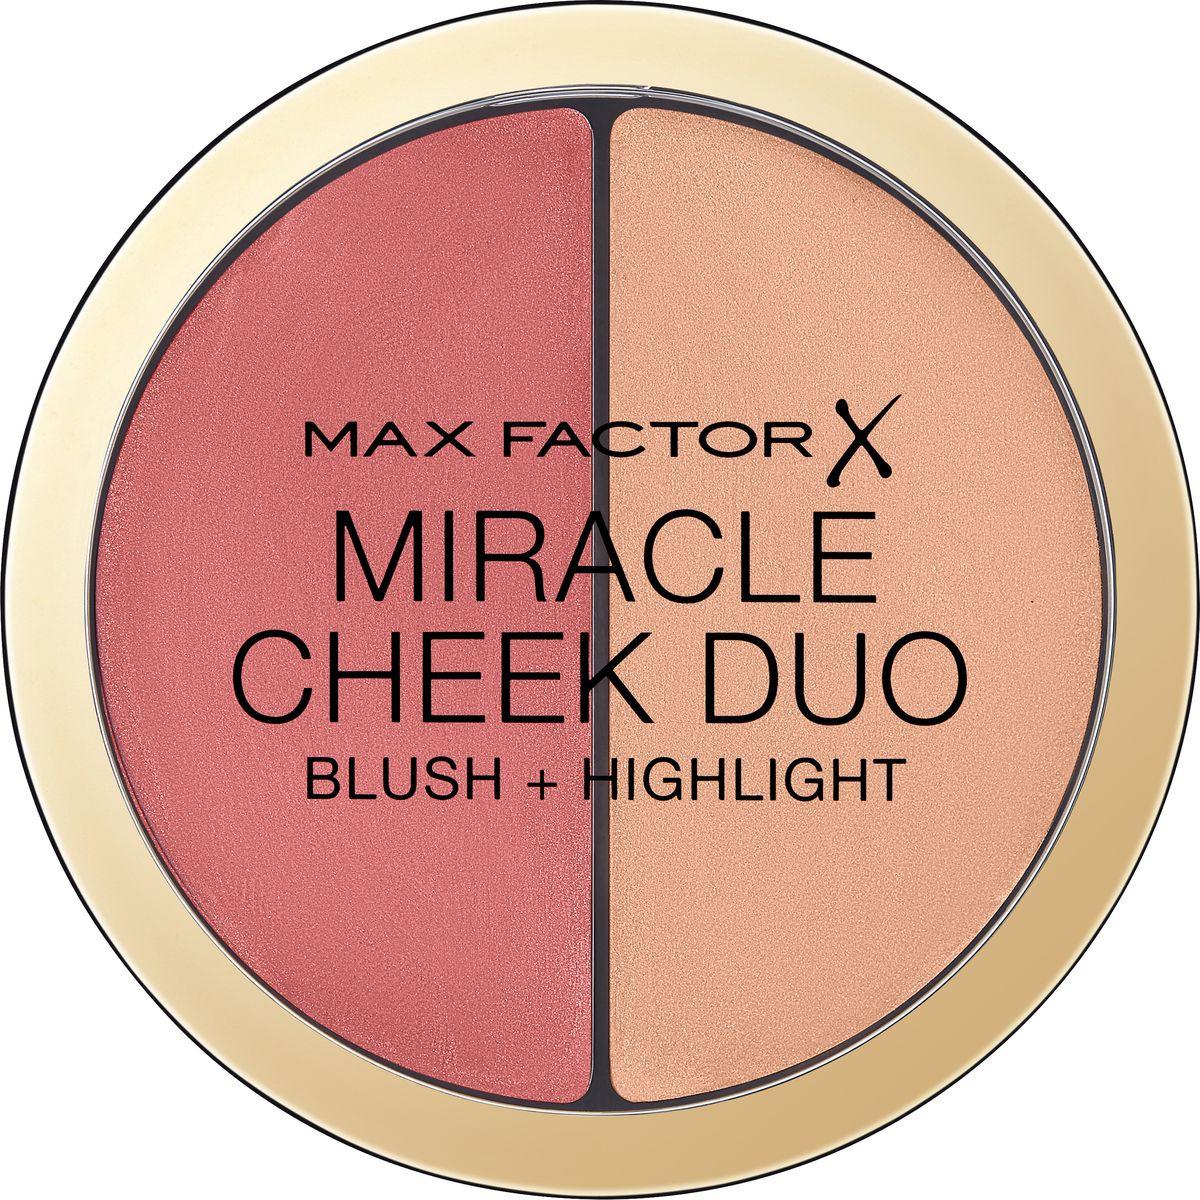 Палетка для контуринга Max Factor Miracle Cheek Duo, тон 20 brown peach & champagne все цены